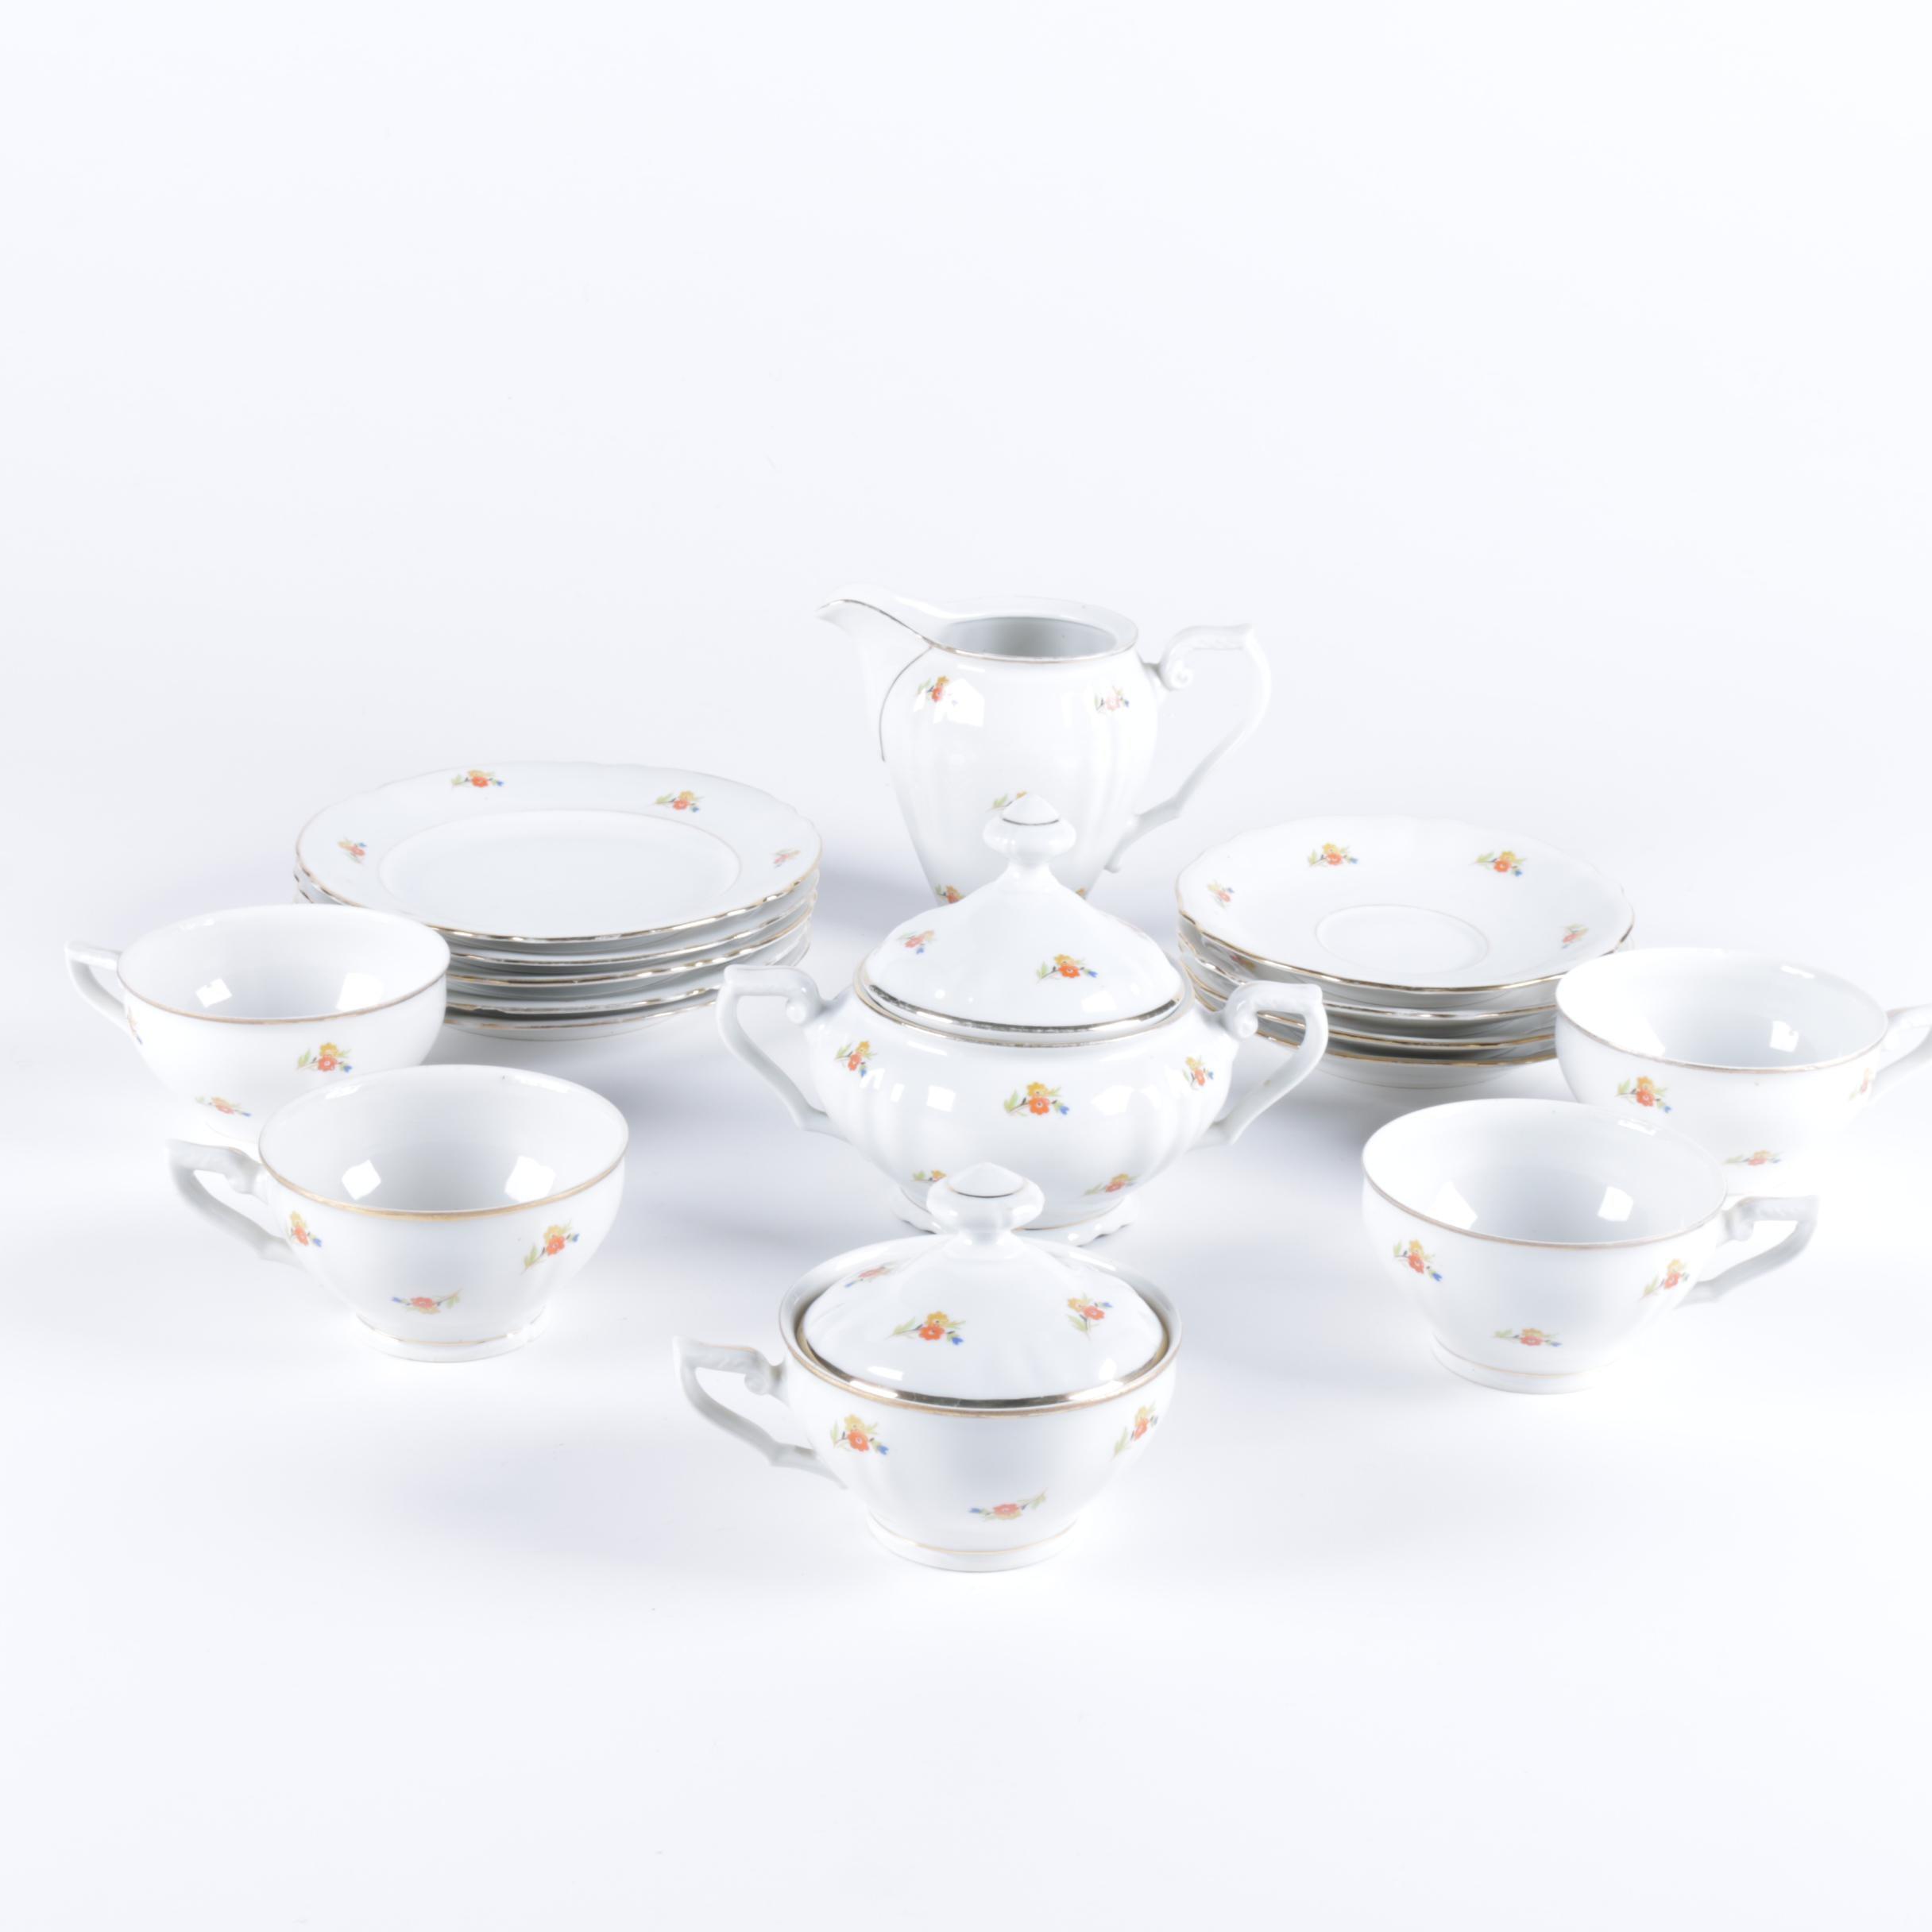 Czechoslovakian Porcelain Tea Set